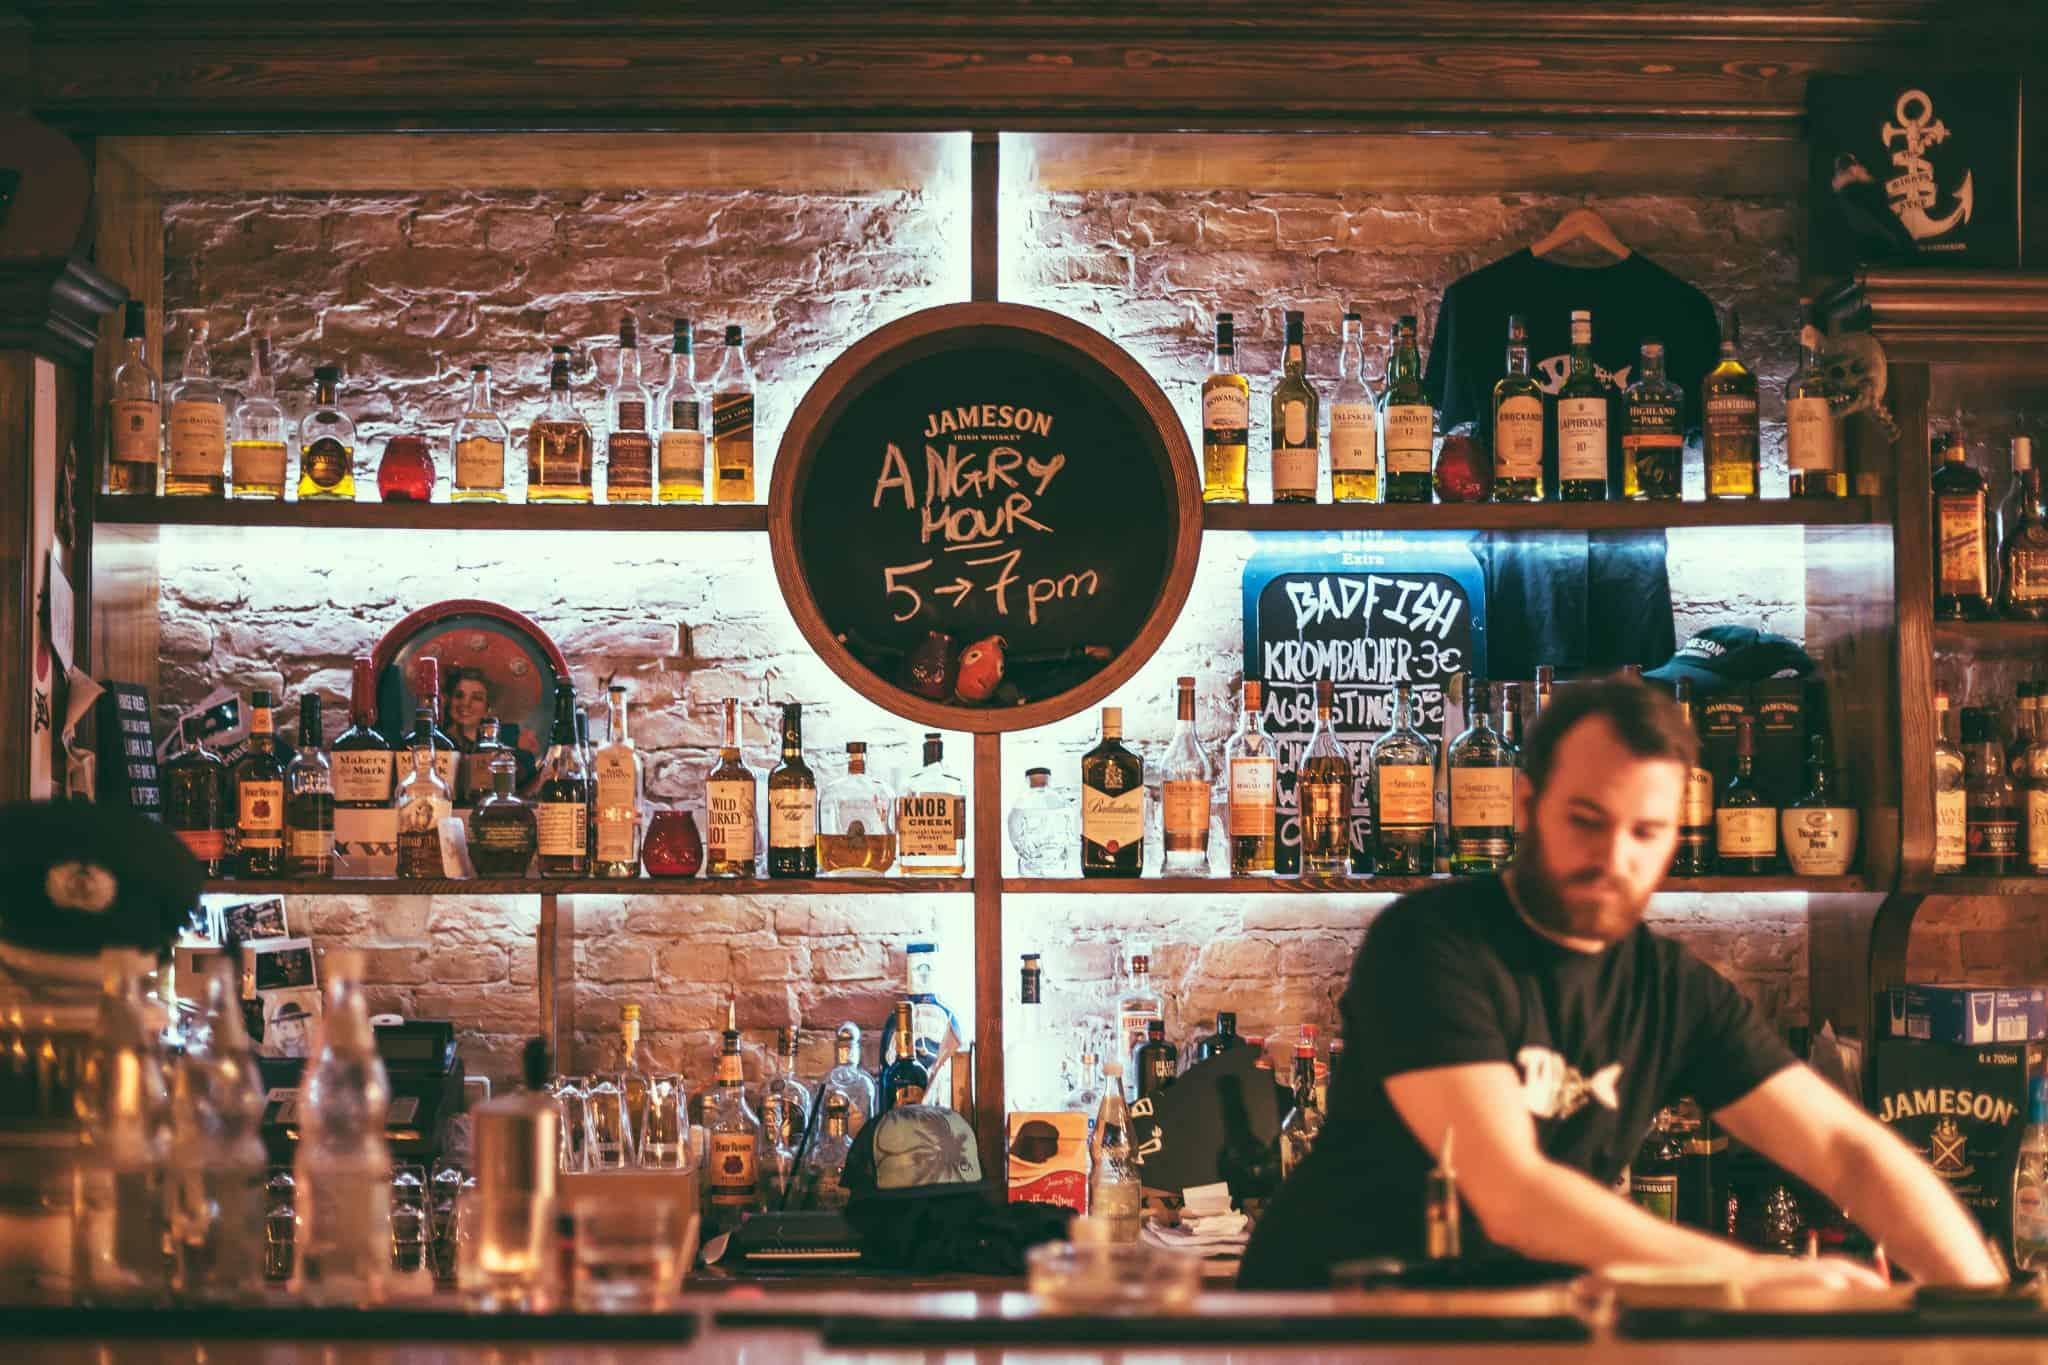 Bad to the Bone: An Irish Pocket in Prenzlauer Berg | BERLIN LOVES YOU